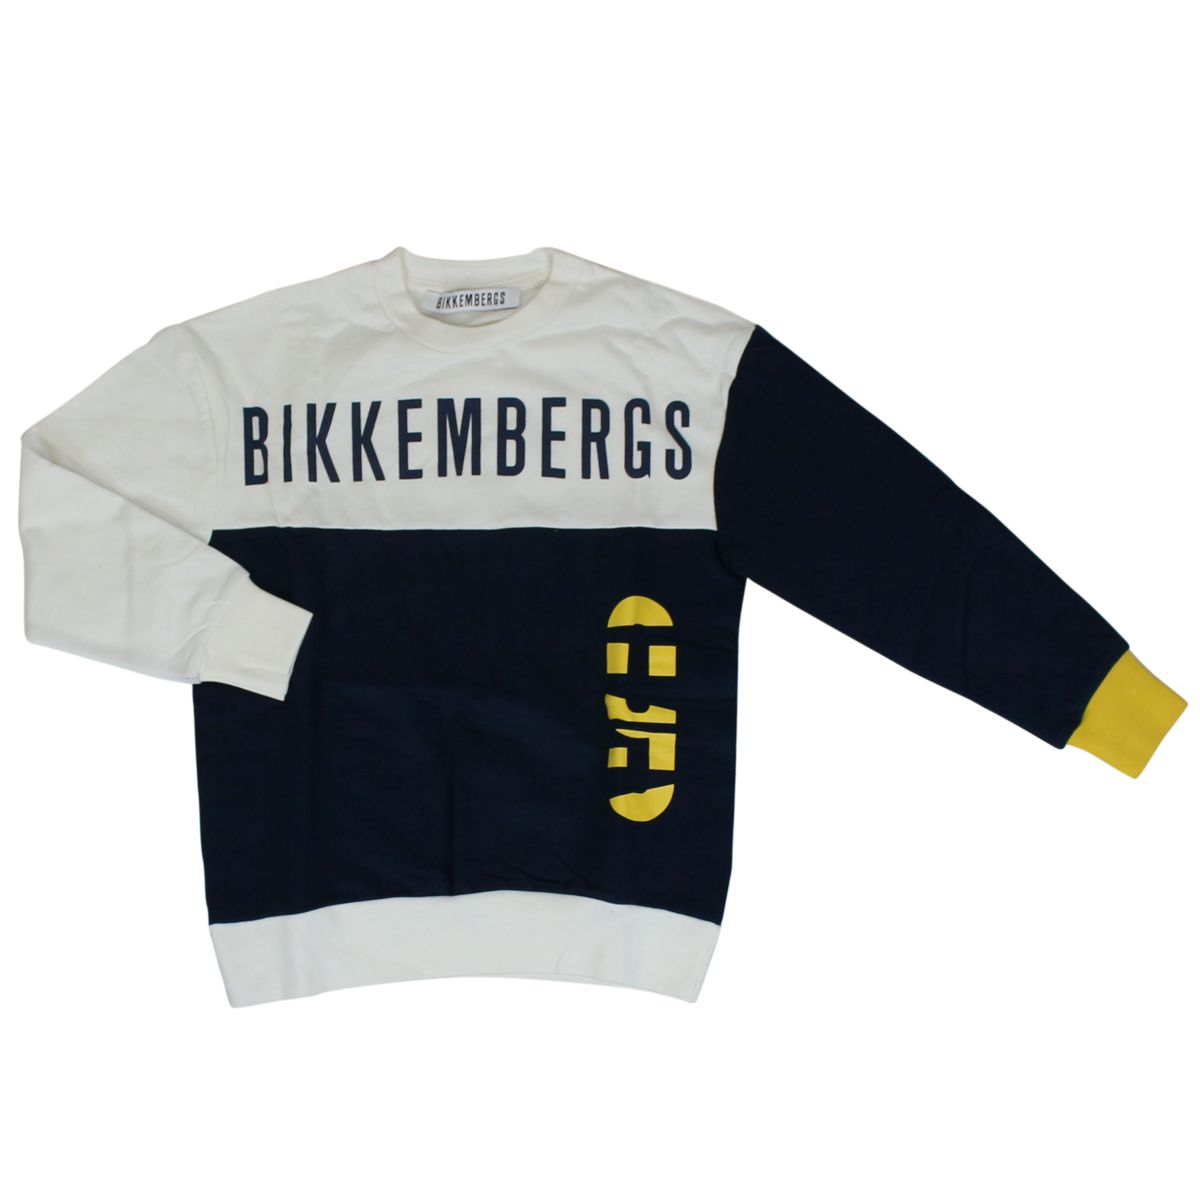 Cotton sweatshirt with maxi logo White / blue Bikkembergs